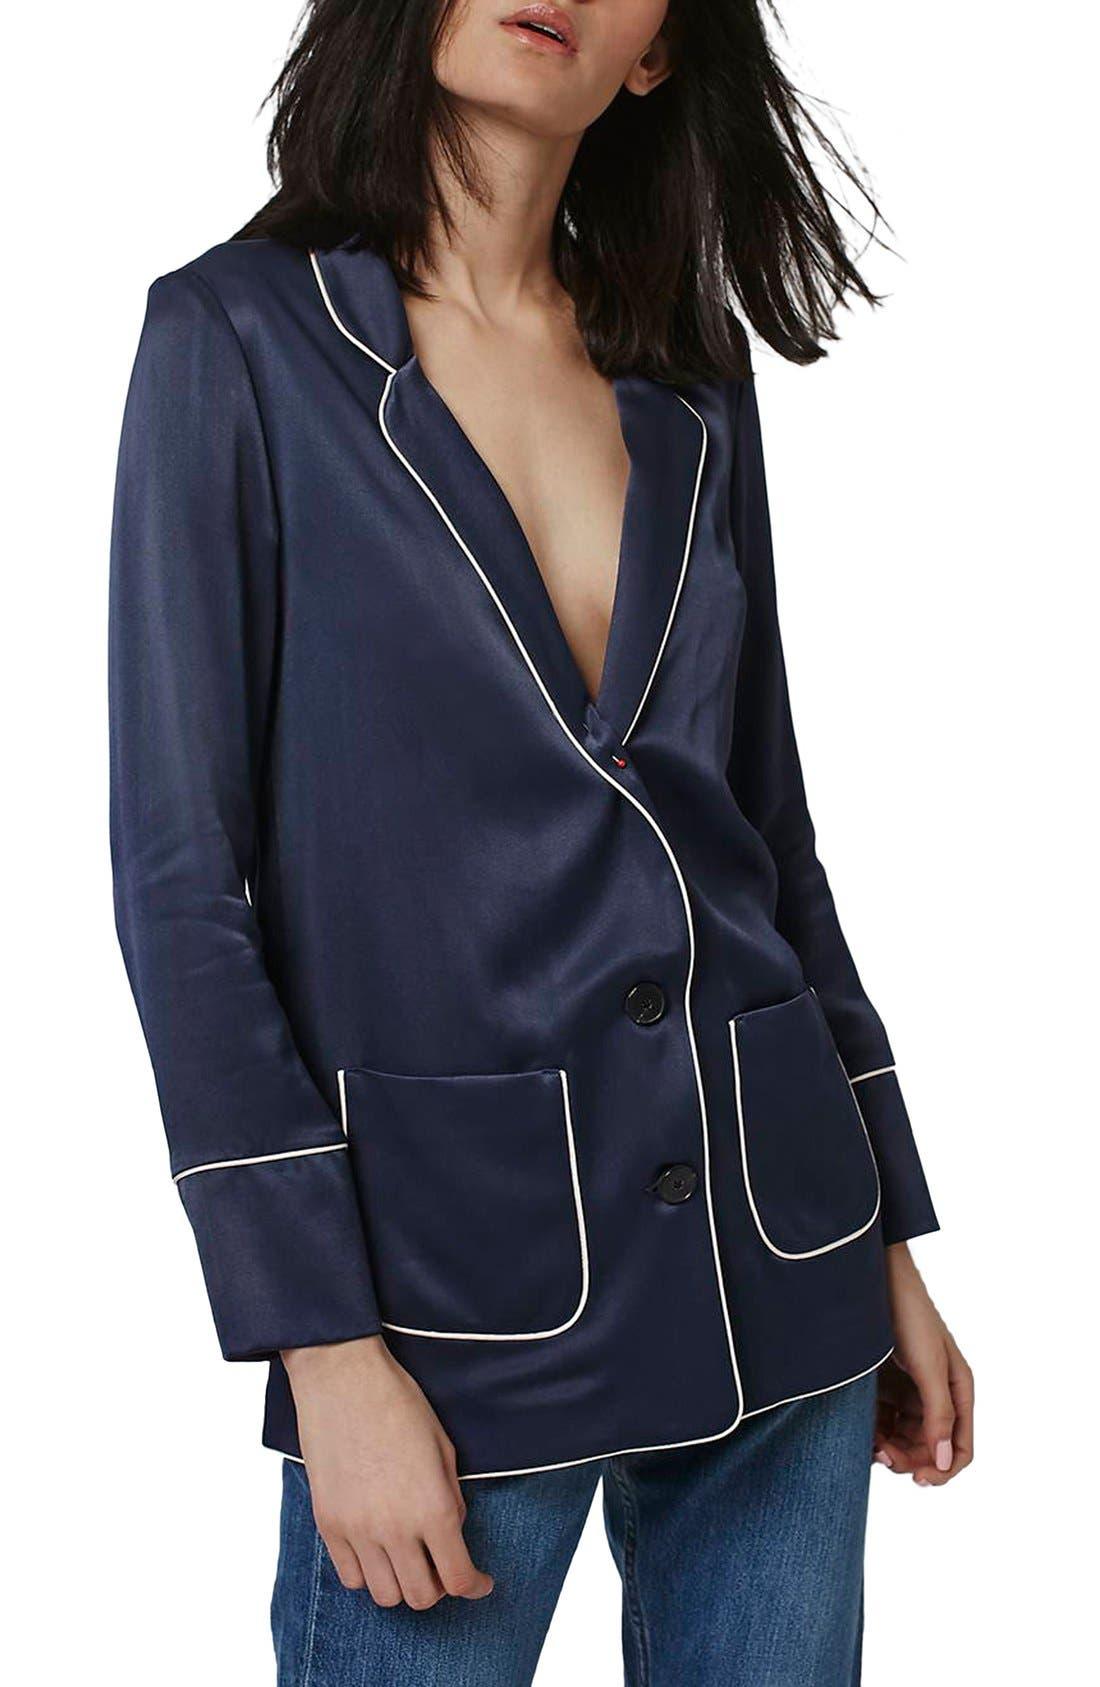 Alternate Image 1 Selected - Topshop Satin Pajama Style Jacket